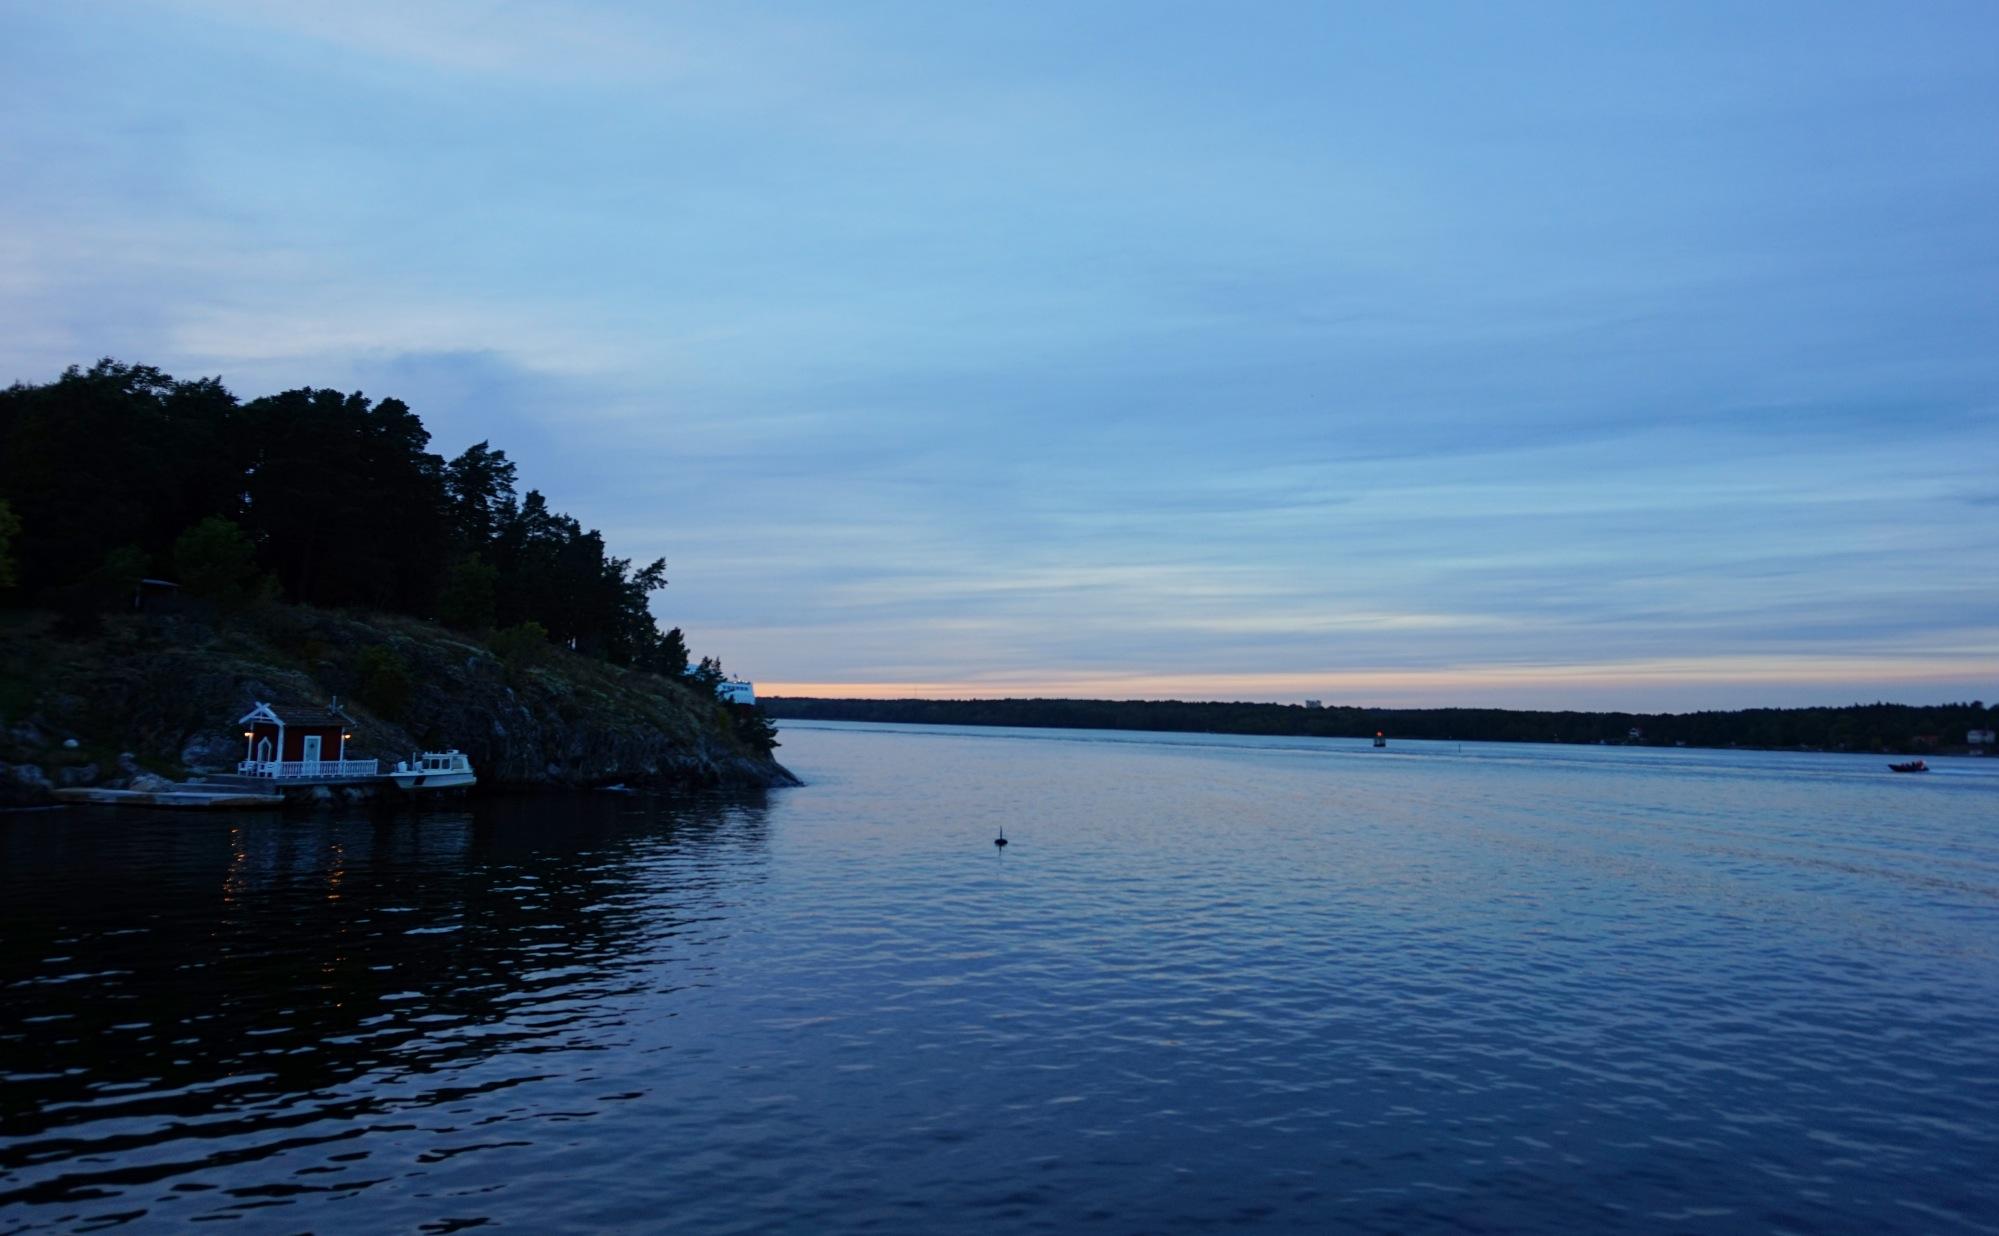 3-jours-a-stockholm-70